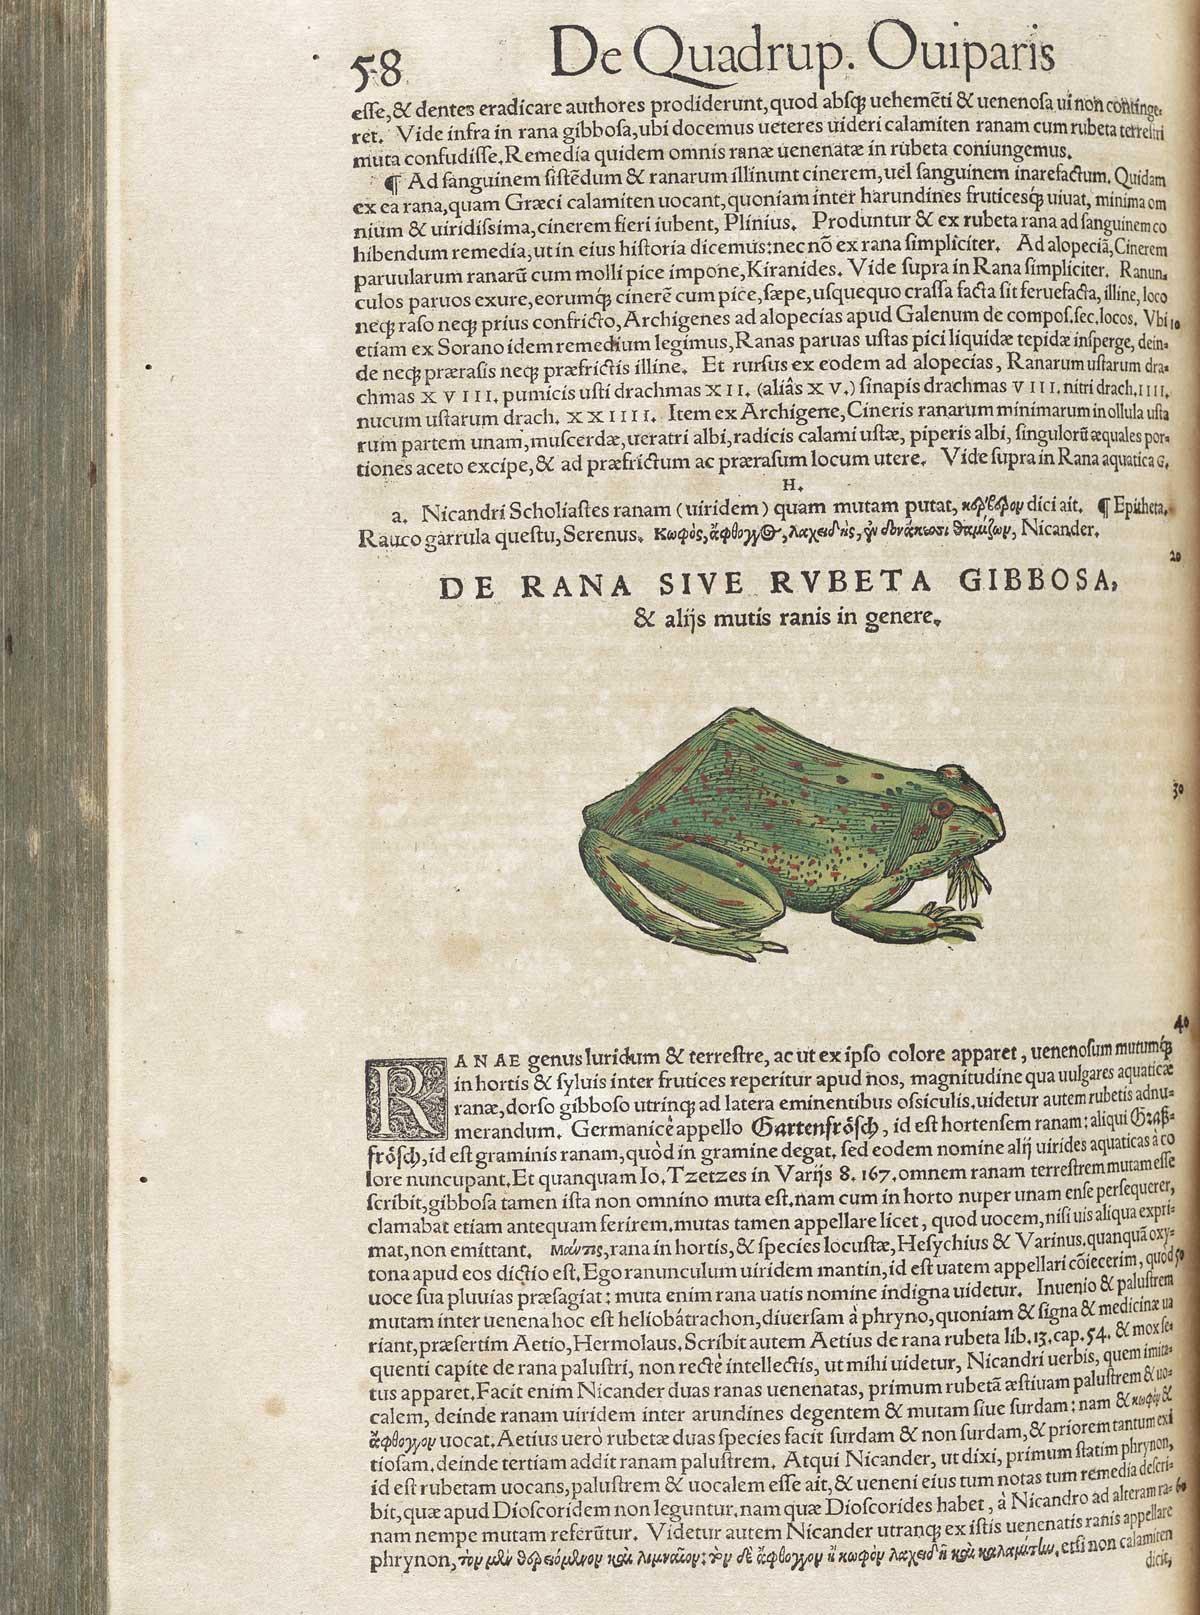 https://www.nlm.nih.gov/exhibition/historicalanatomies/Images/1200_pixels/frog_39.jpg